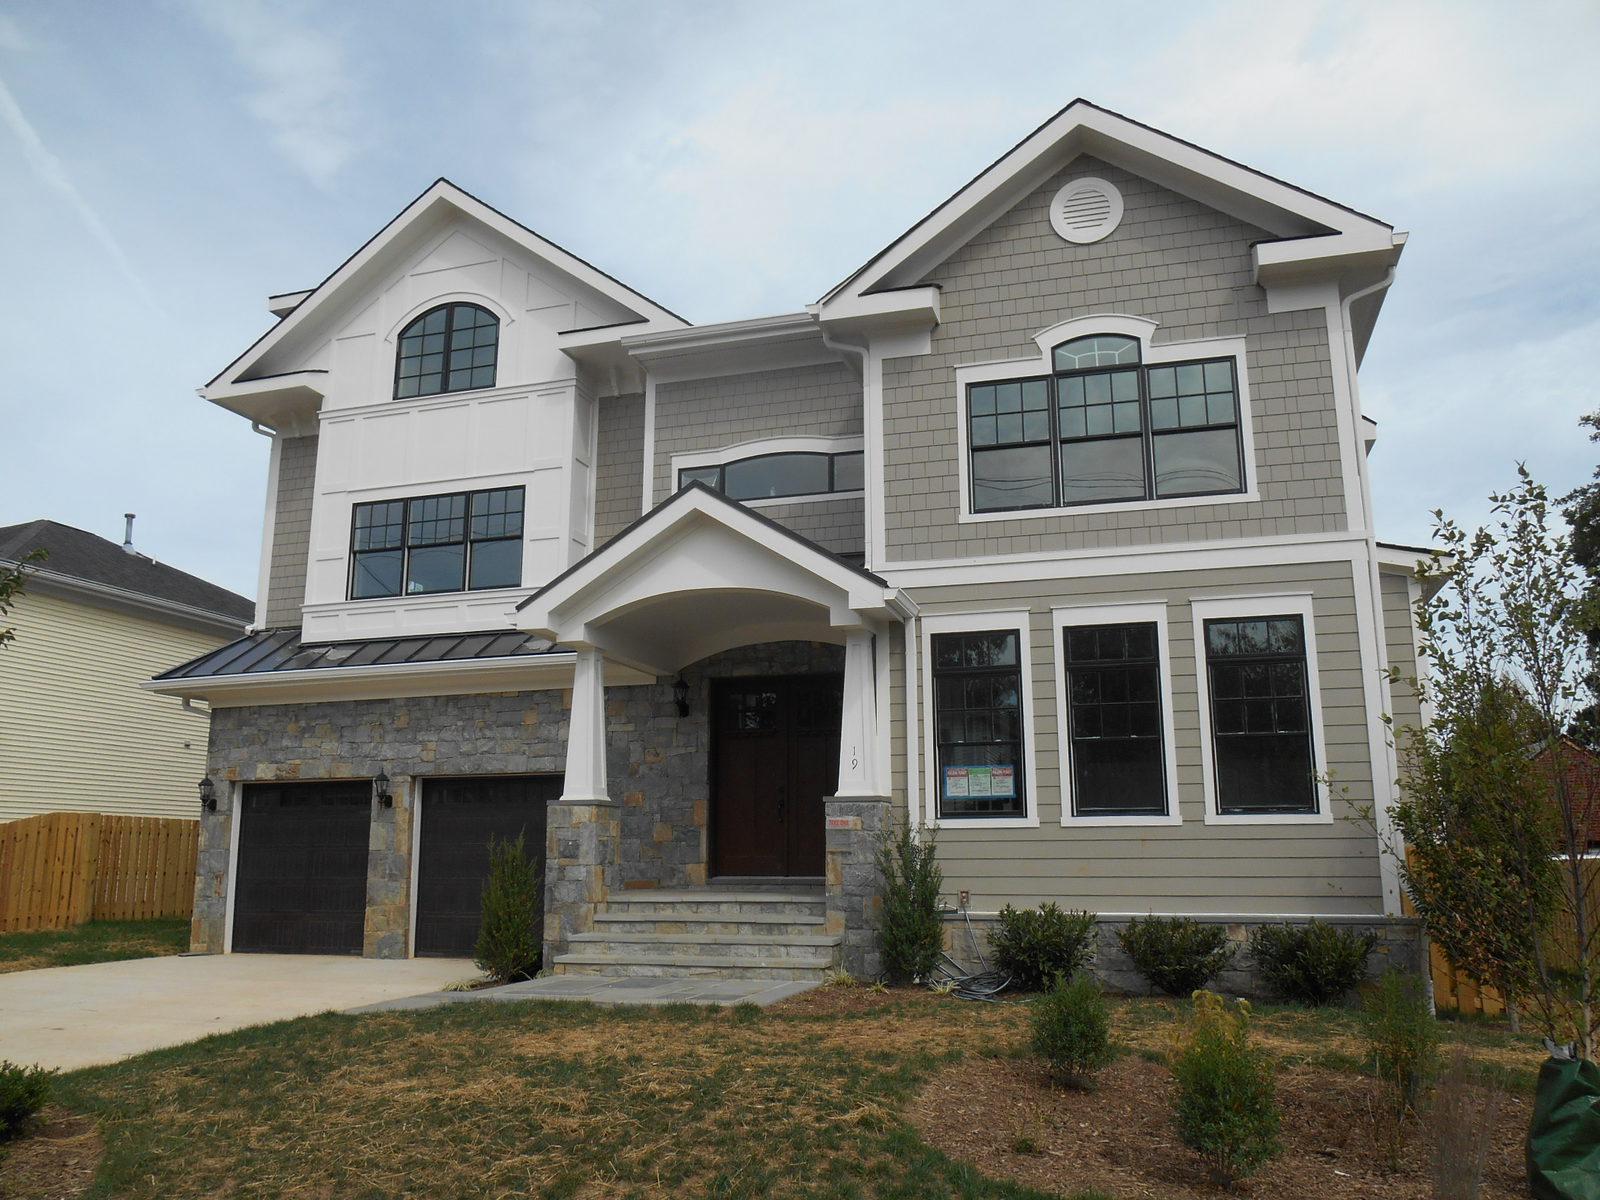 Single Family Home for Sale at 19 Highland Street N, Arlington Arlington, Virginia 22201 United States